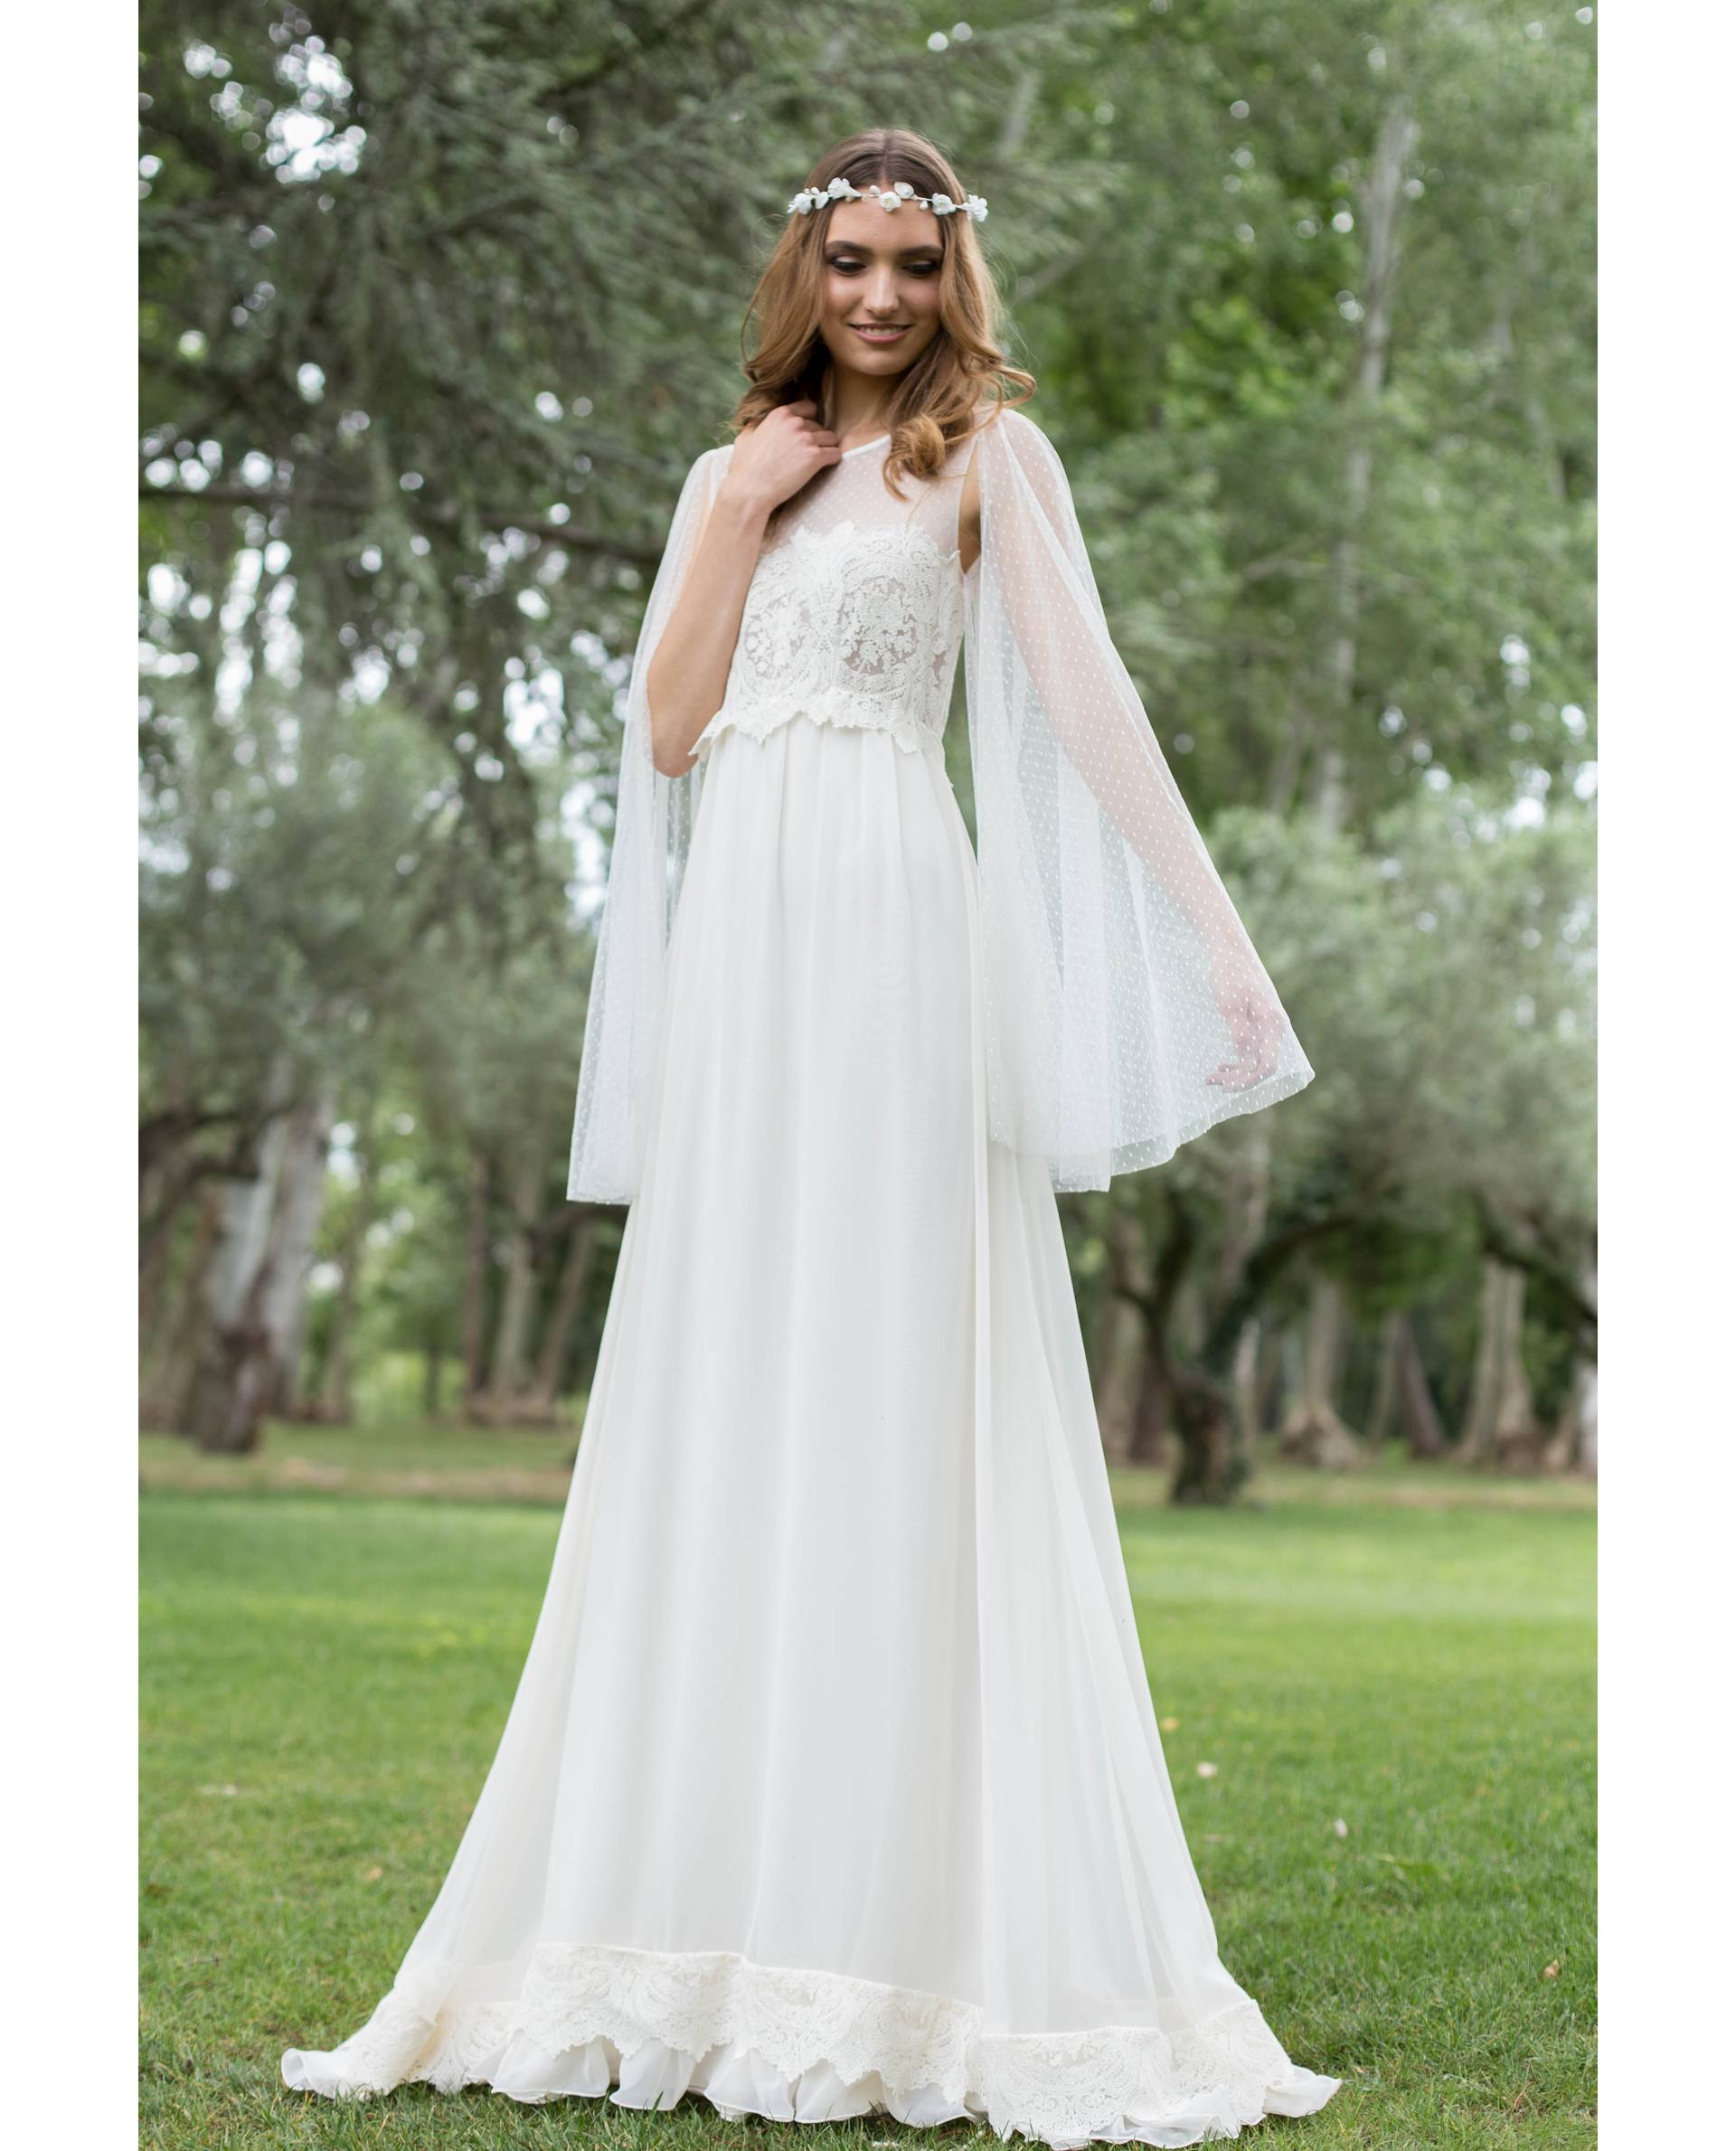 BRIDAL-NATURE 2018/19 - VESTIDOS - vestido novia Eril